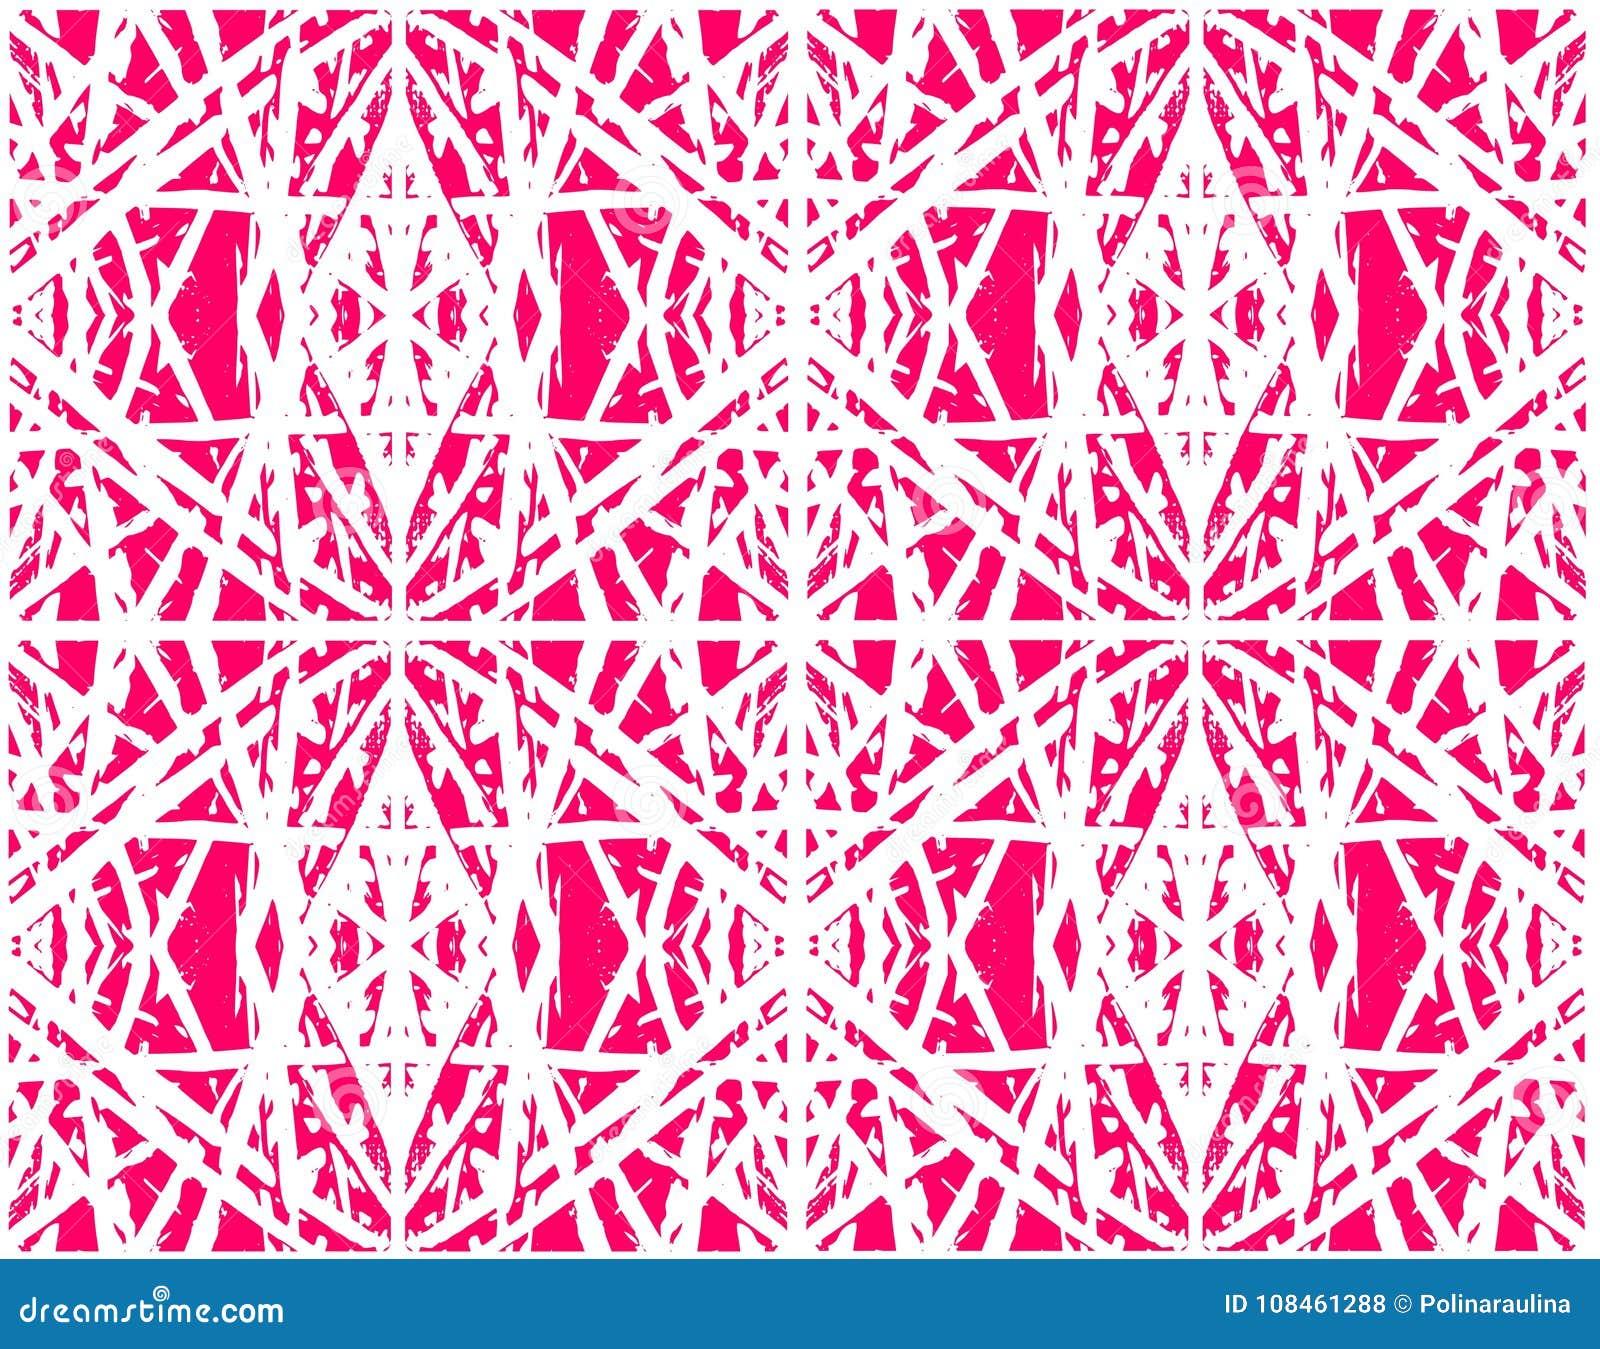 Modelo inconsútil rosado abstracto étnico para la materia textil, las baldosas cerámicas o los fondos